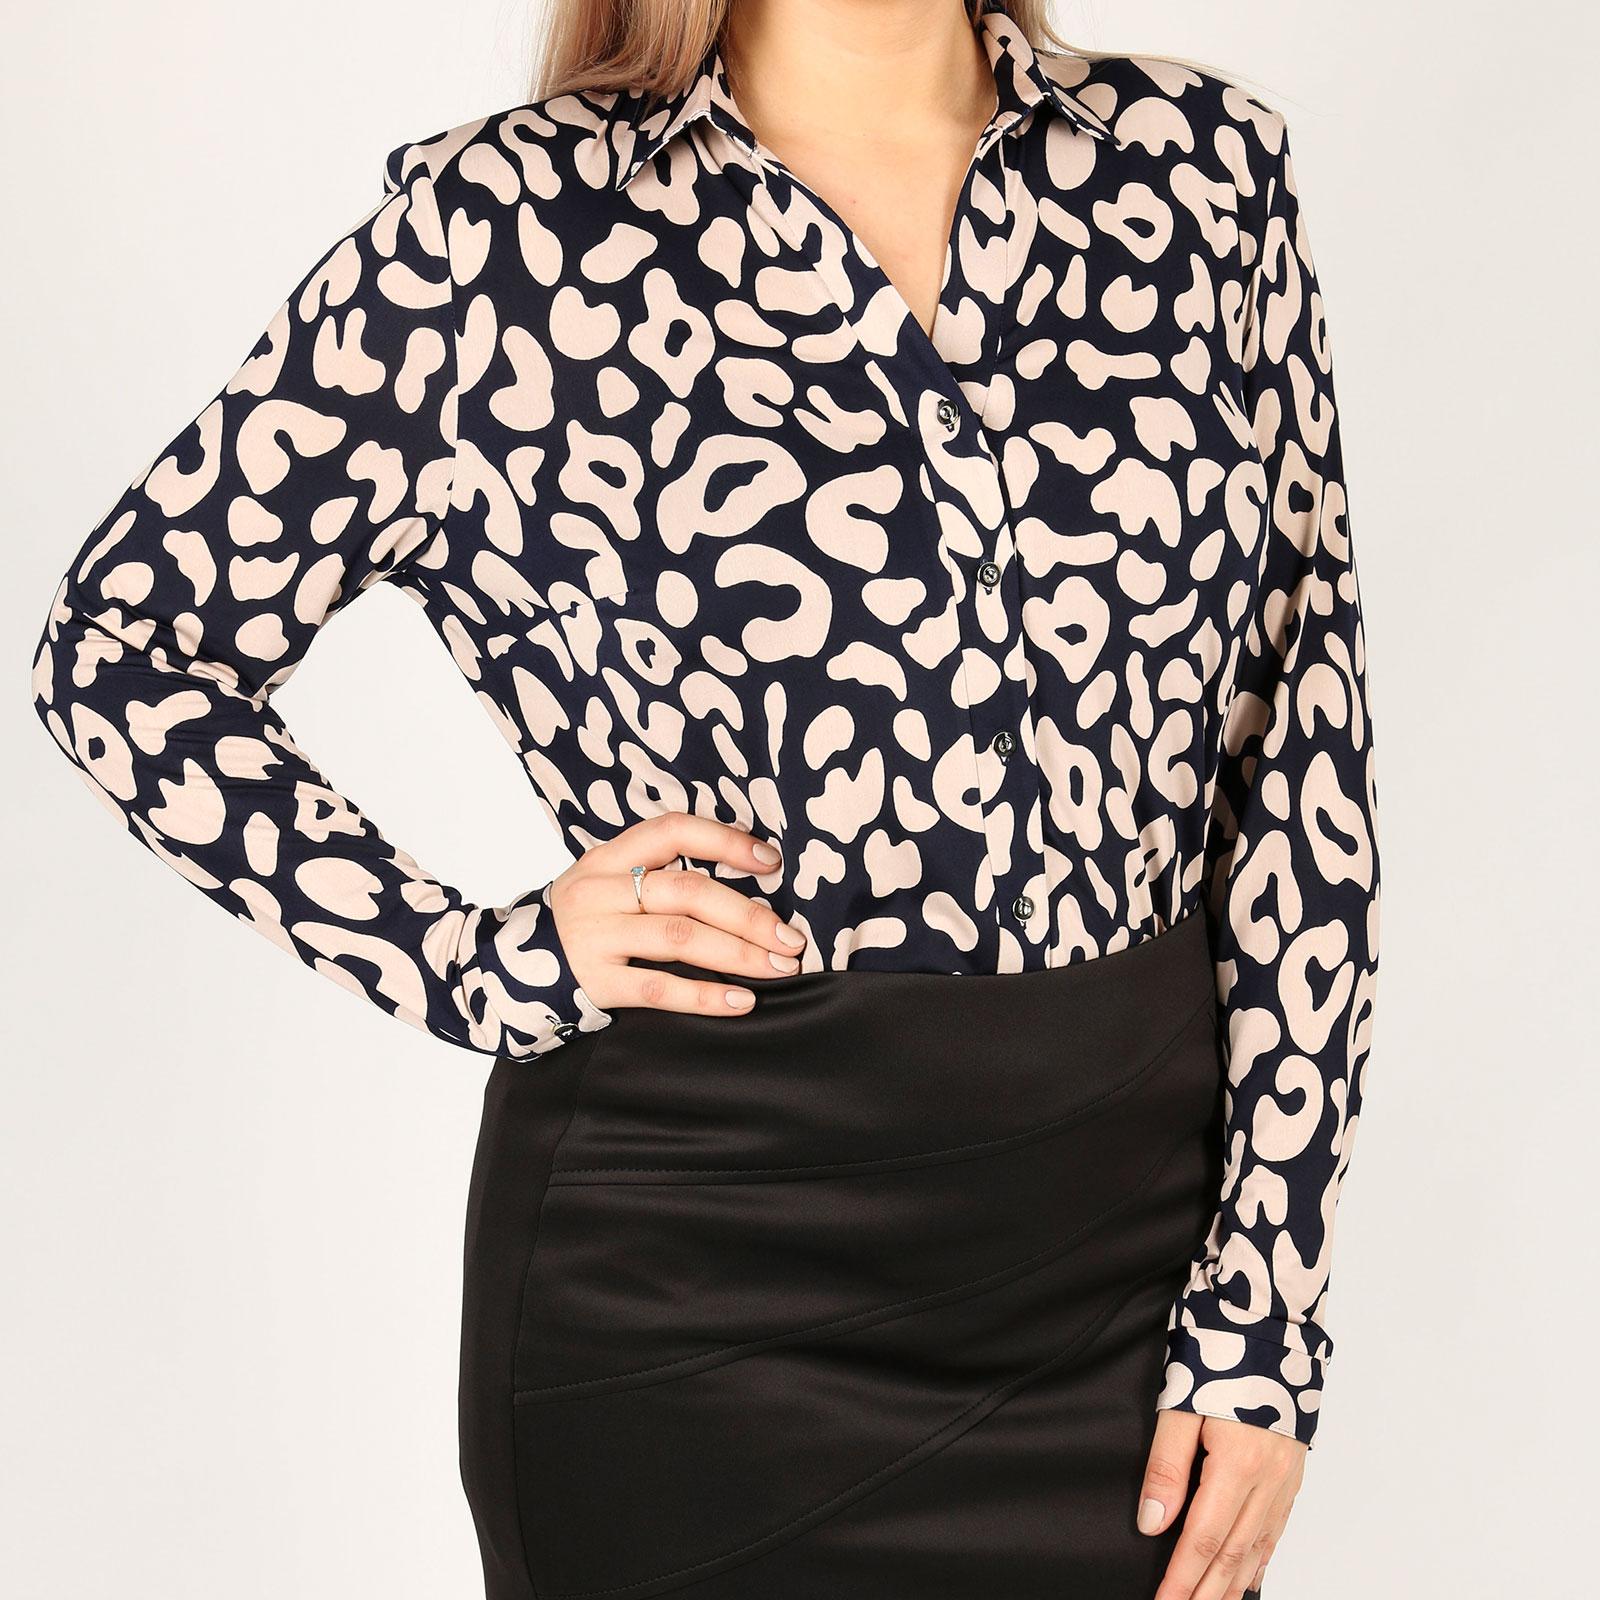 Купить блузку пуговицах